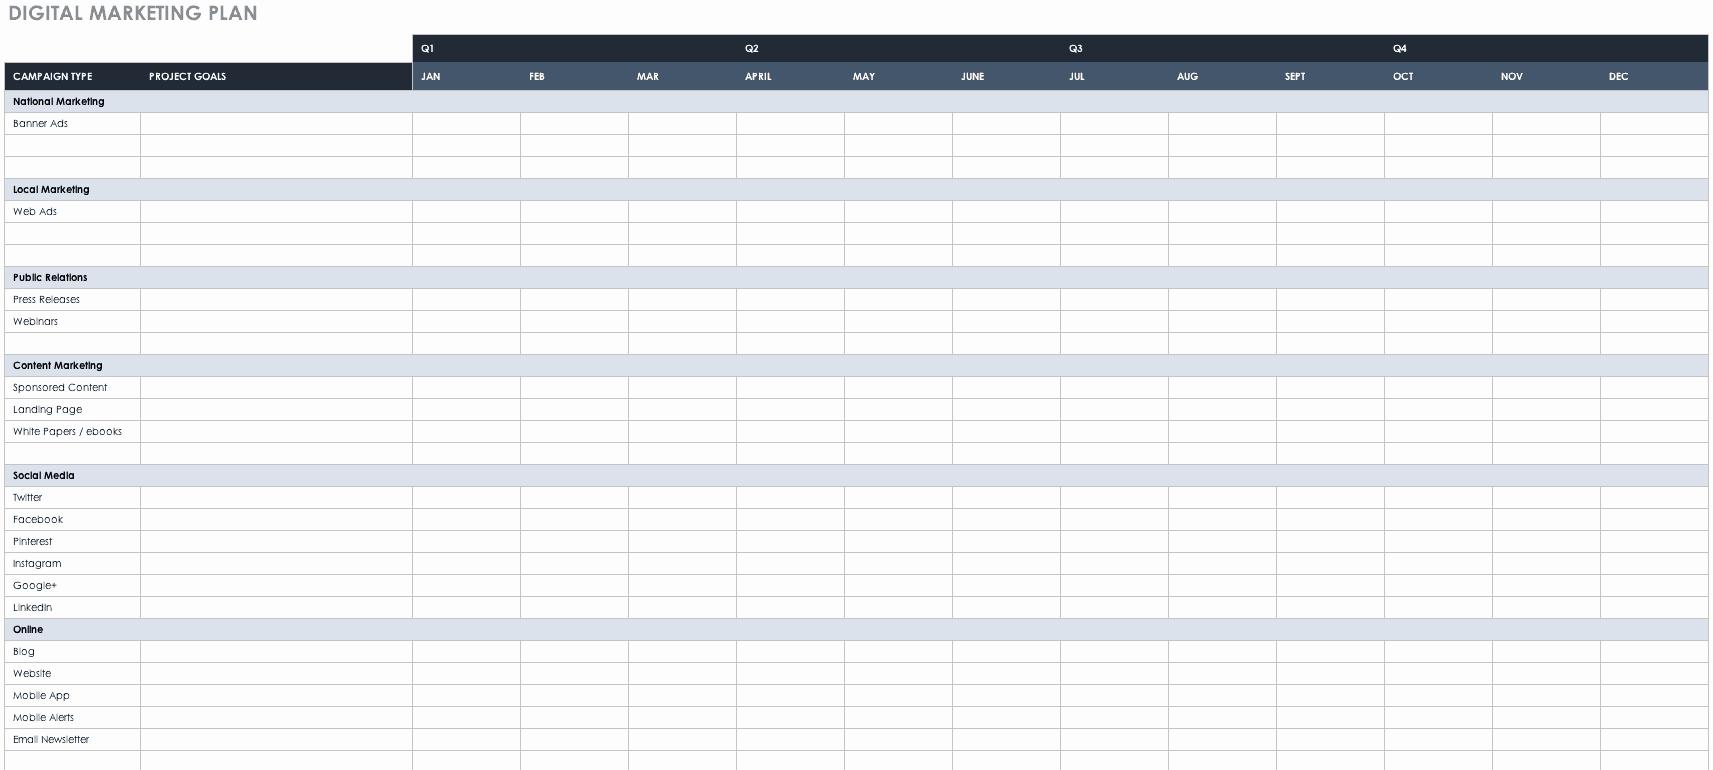 Marketing Plan Outline Template Elegant Free Marketing Plan Templates for Excel